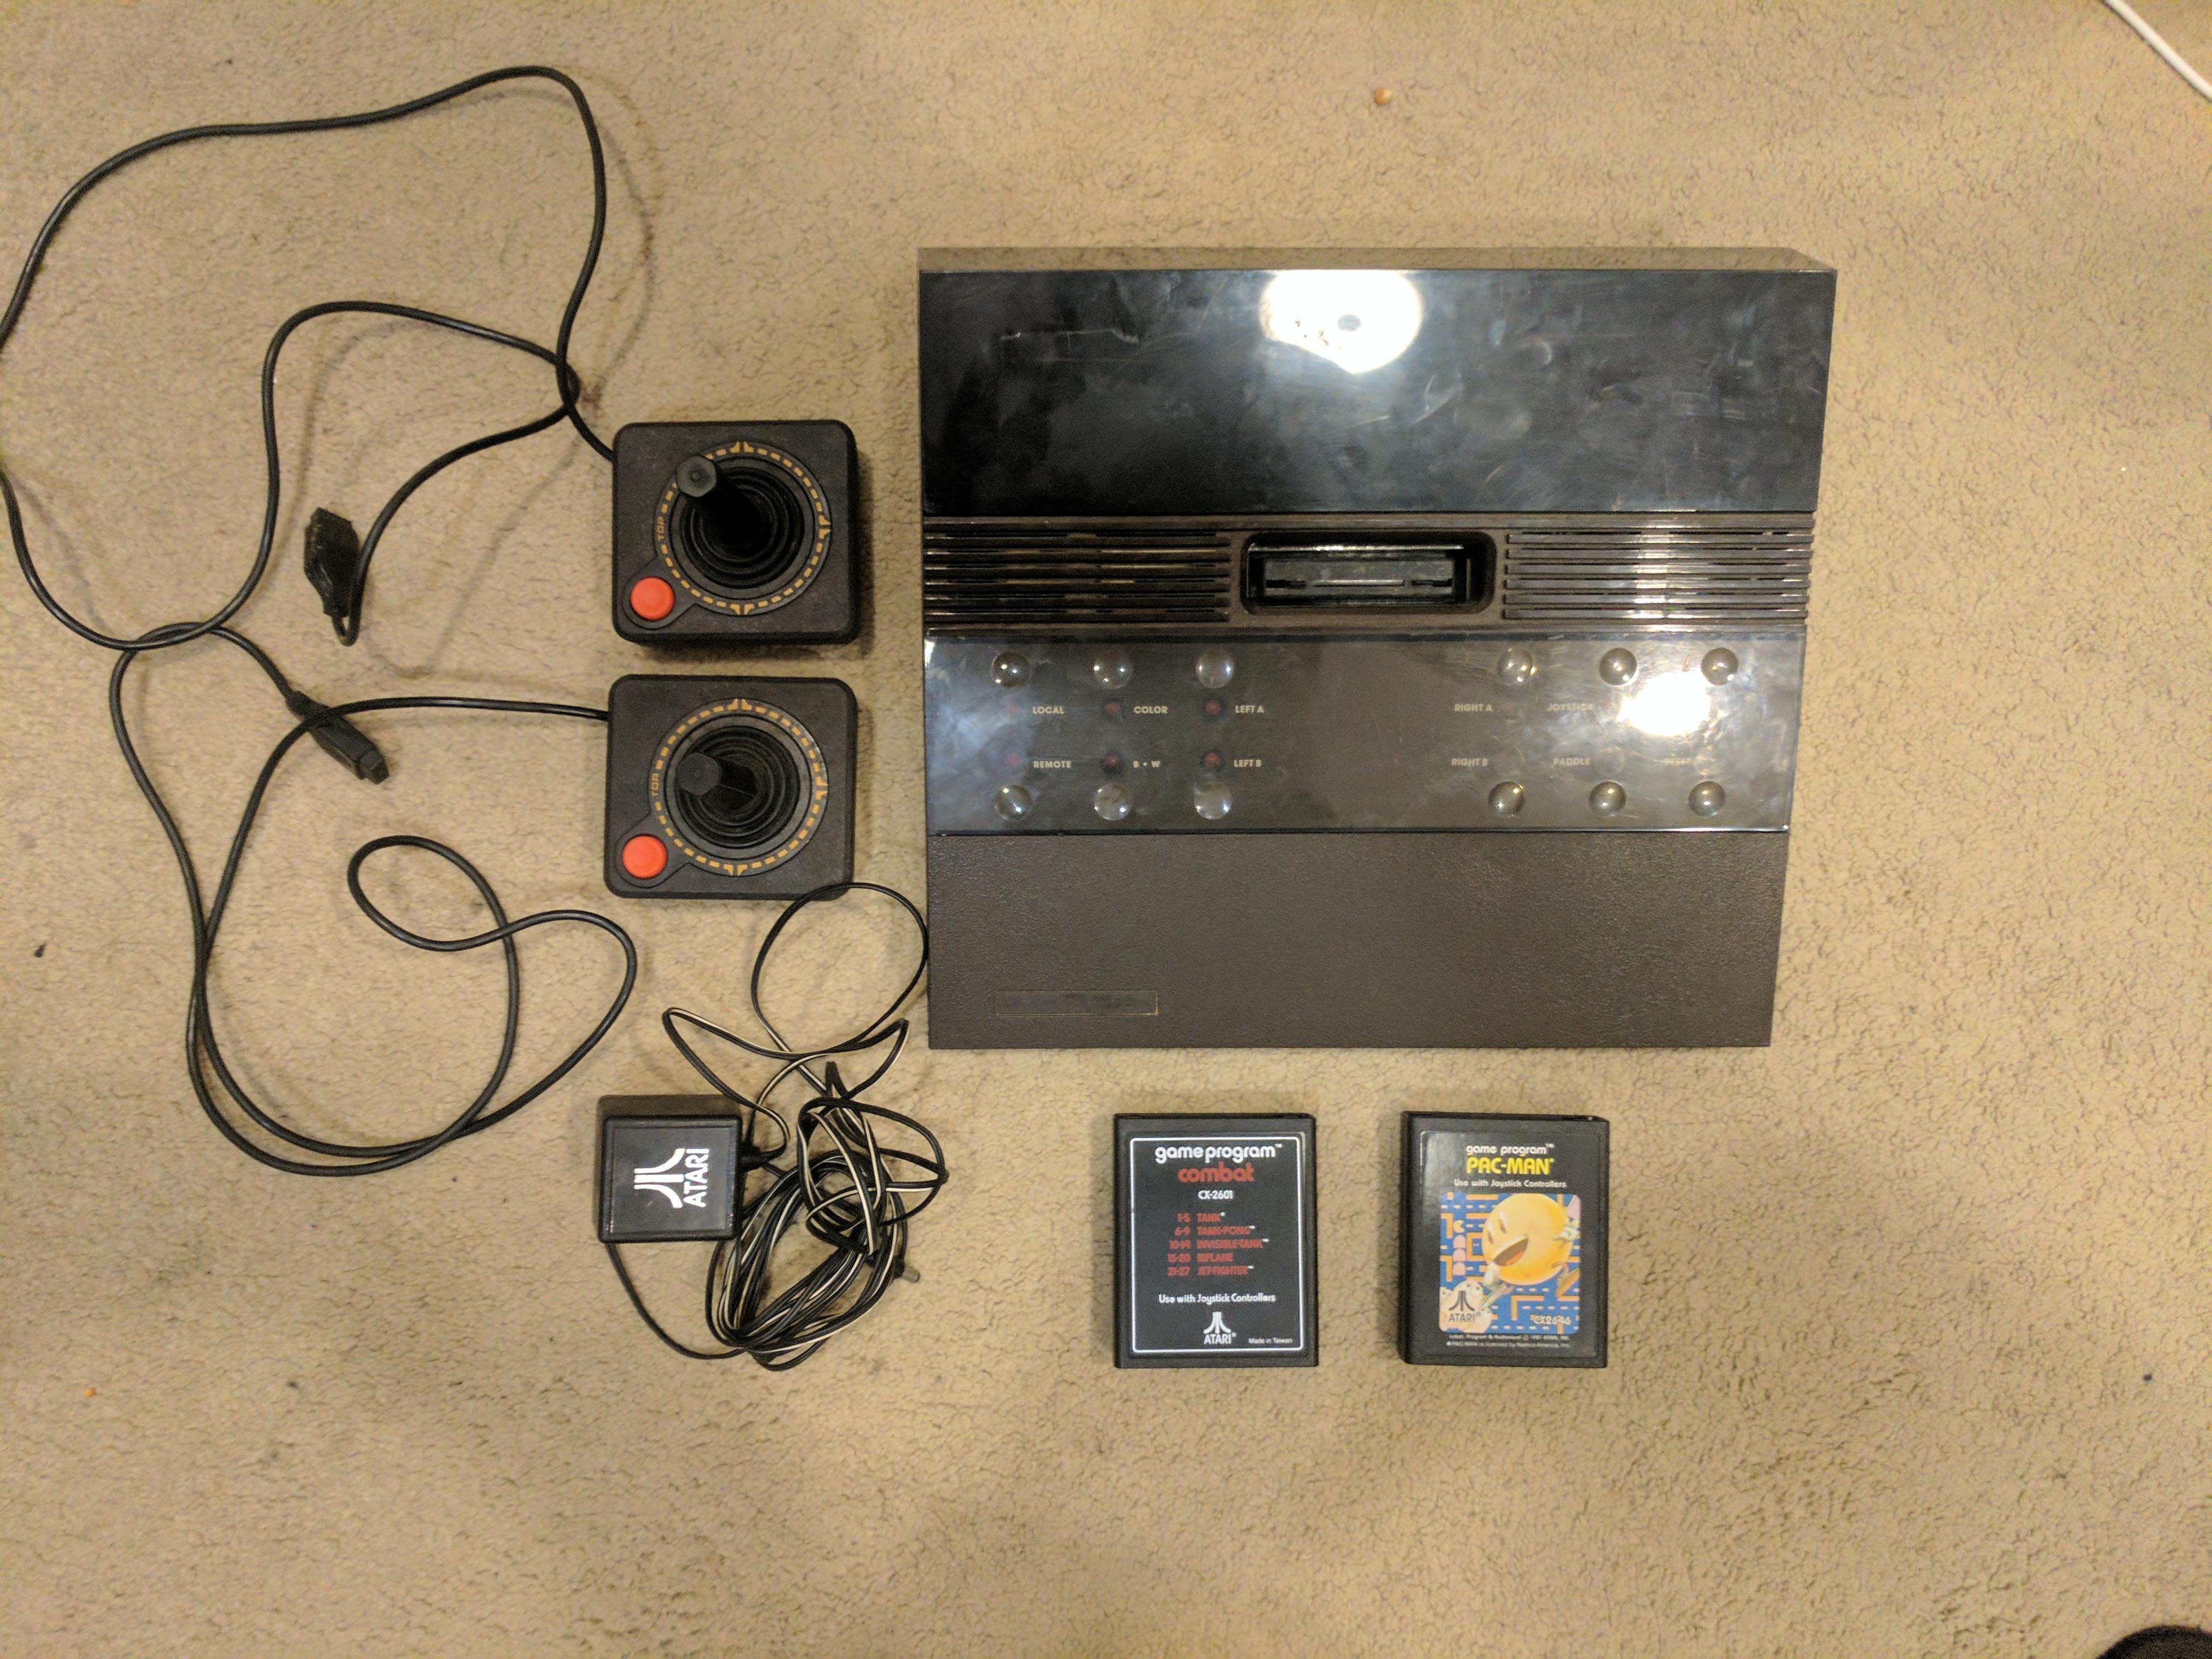 Man finds rare Atari 2700 prototype at thrift store screenshot